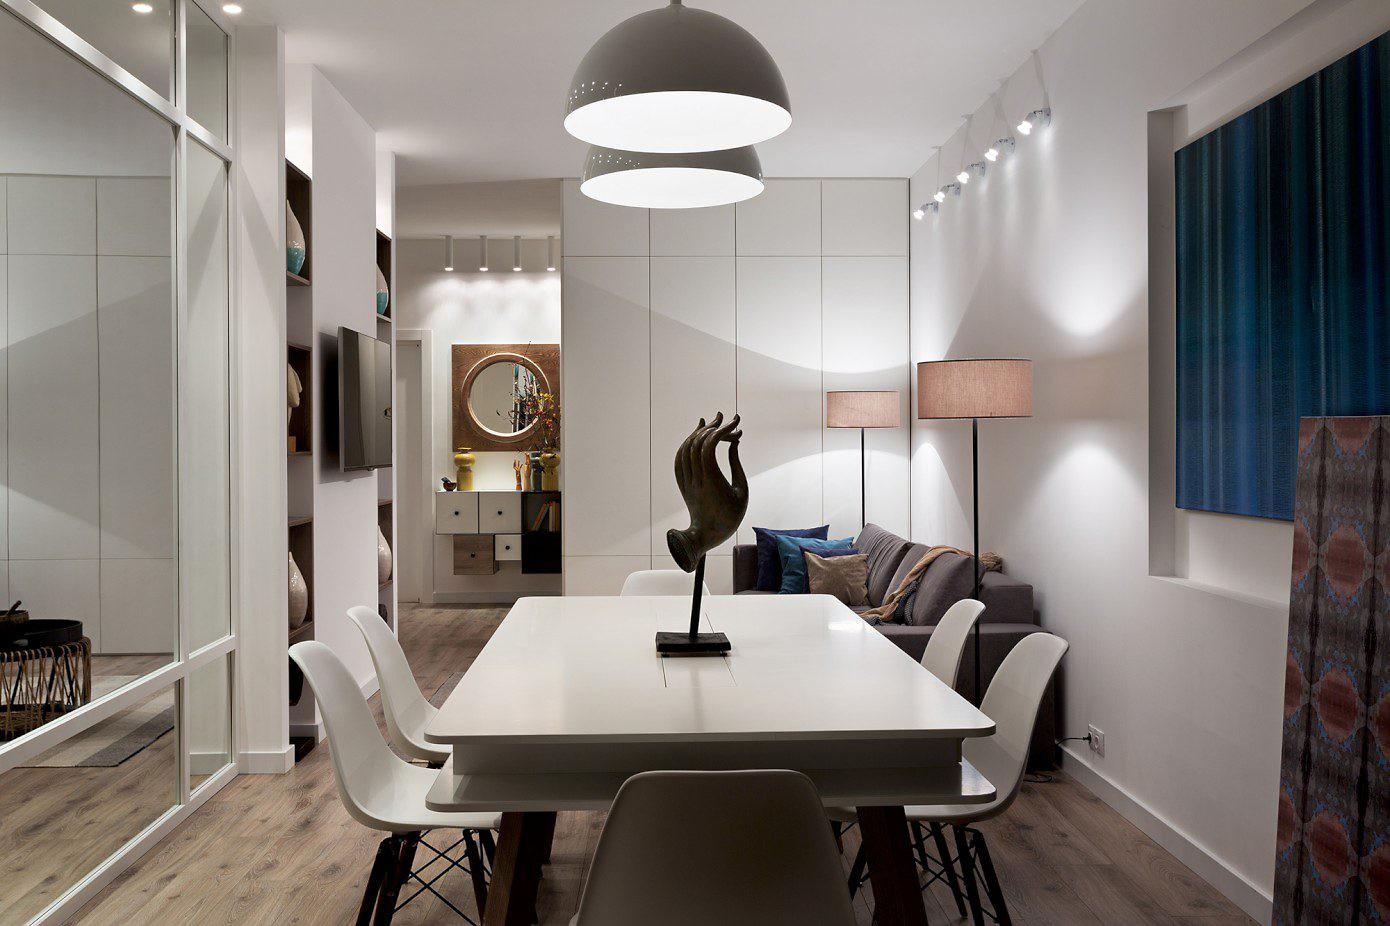 Gingerbread Apartment by Fateeva Design